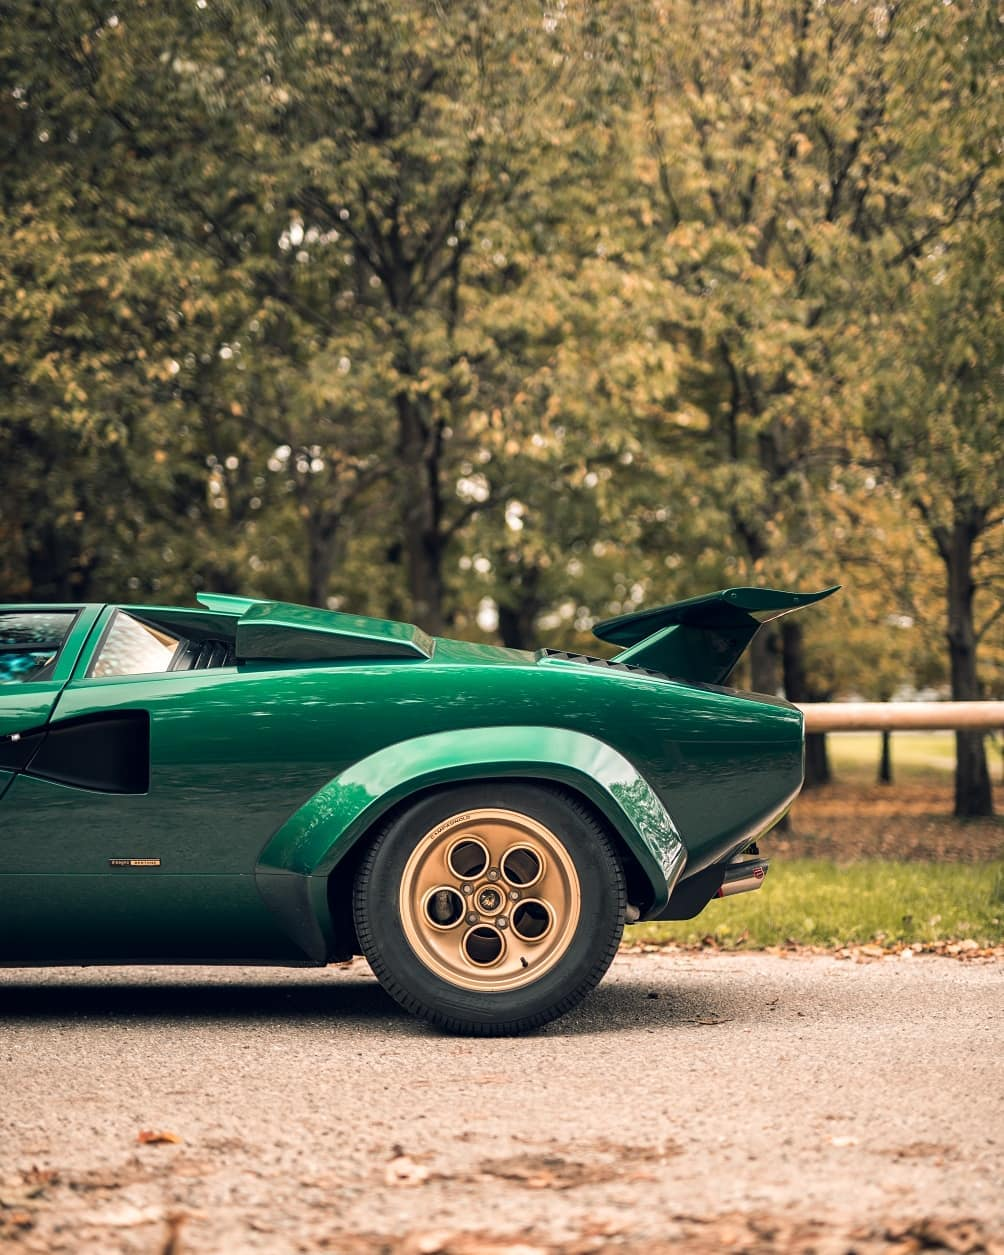 Lamborghini Countach @davidclementephotography - Image 5